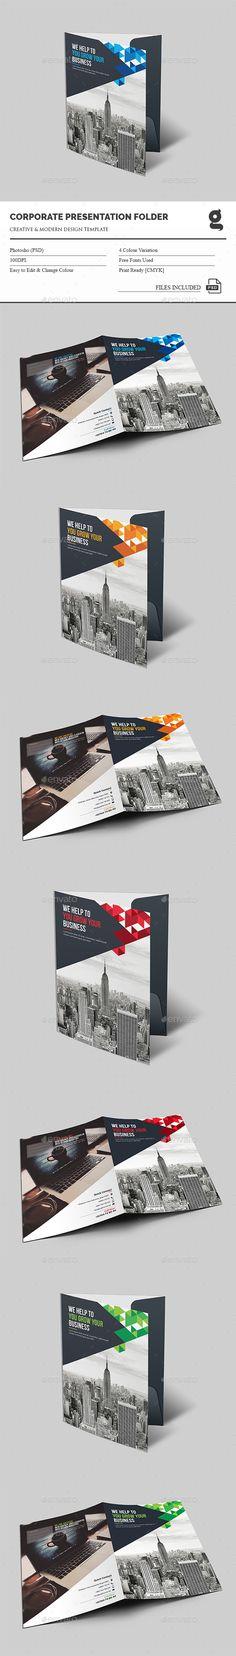 Corporate Presentation Folder Design Template - Stationery Print Template PSD. Download here: https://graphicriver.net/item/presentation-folder/16718414?s_rank=7&ref=yinkira